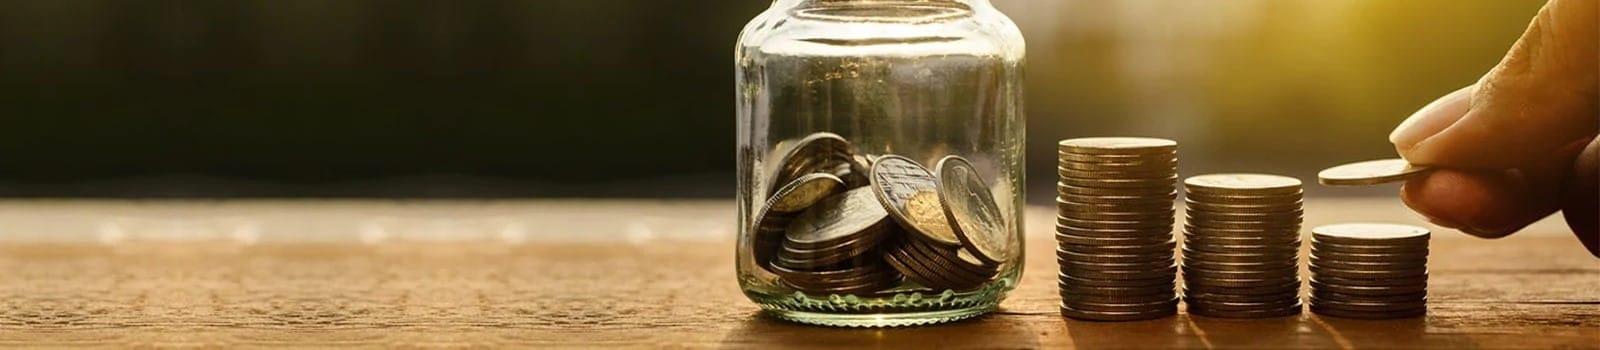 JustOne Savings Account